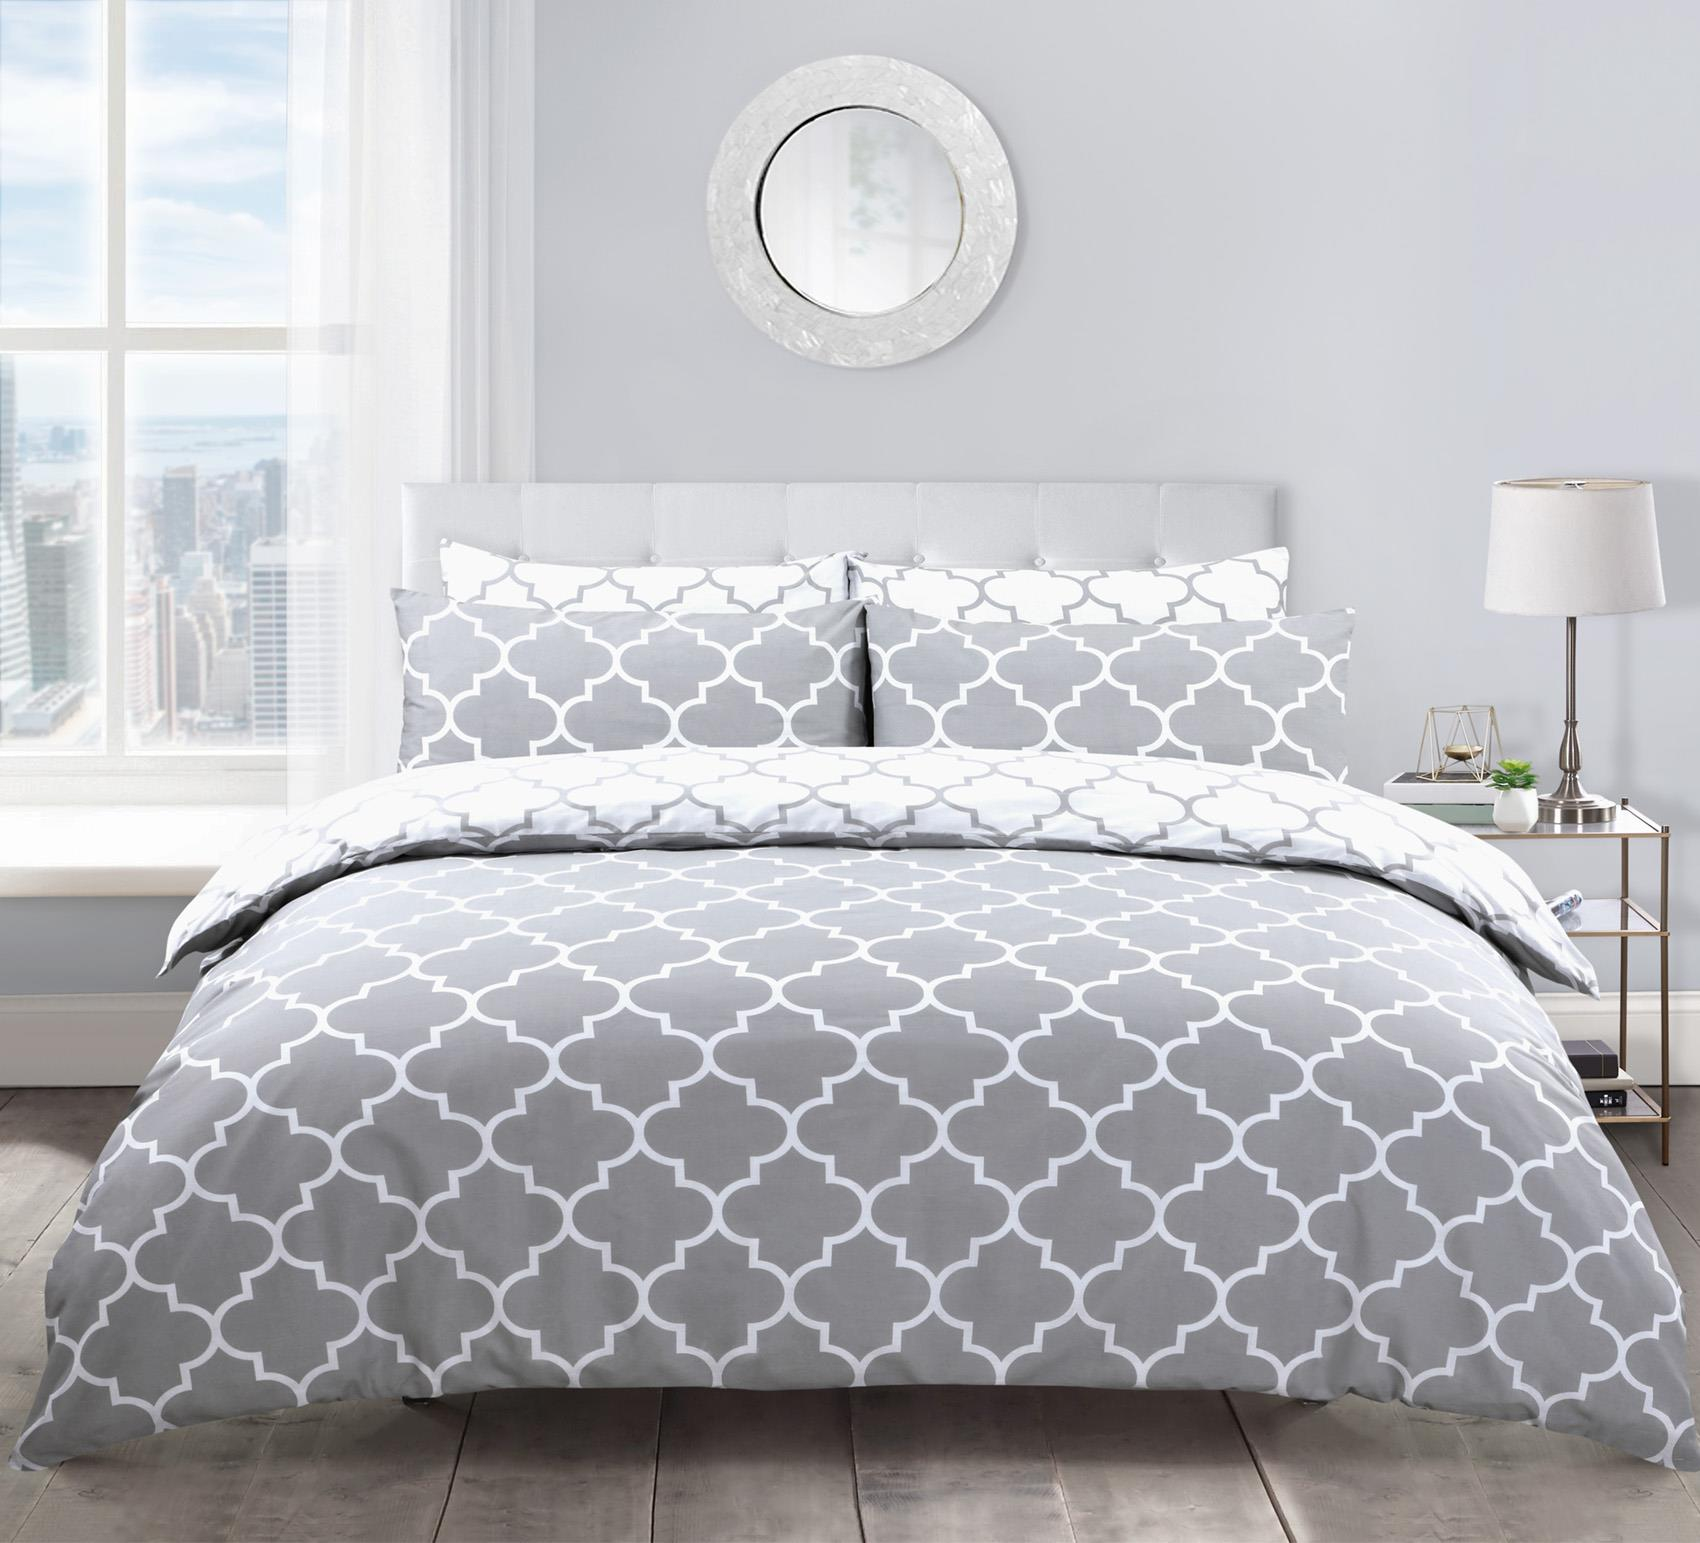 Geometric Lattice Patterned Reversible Grey White King Size Duvet Cover